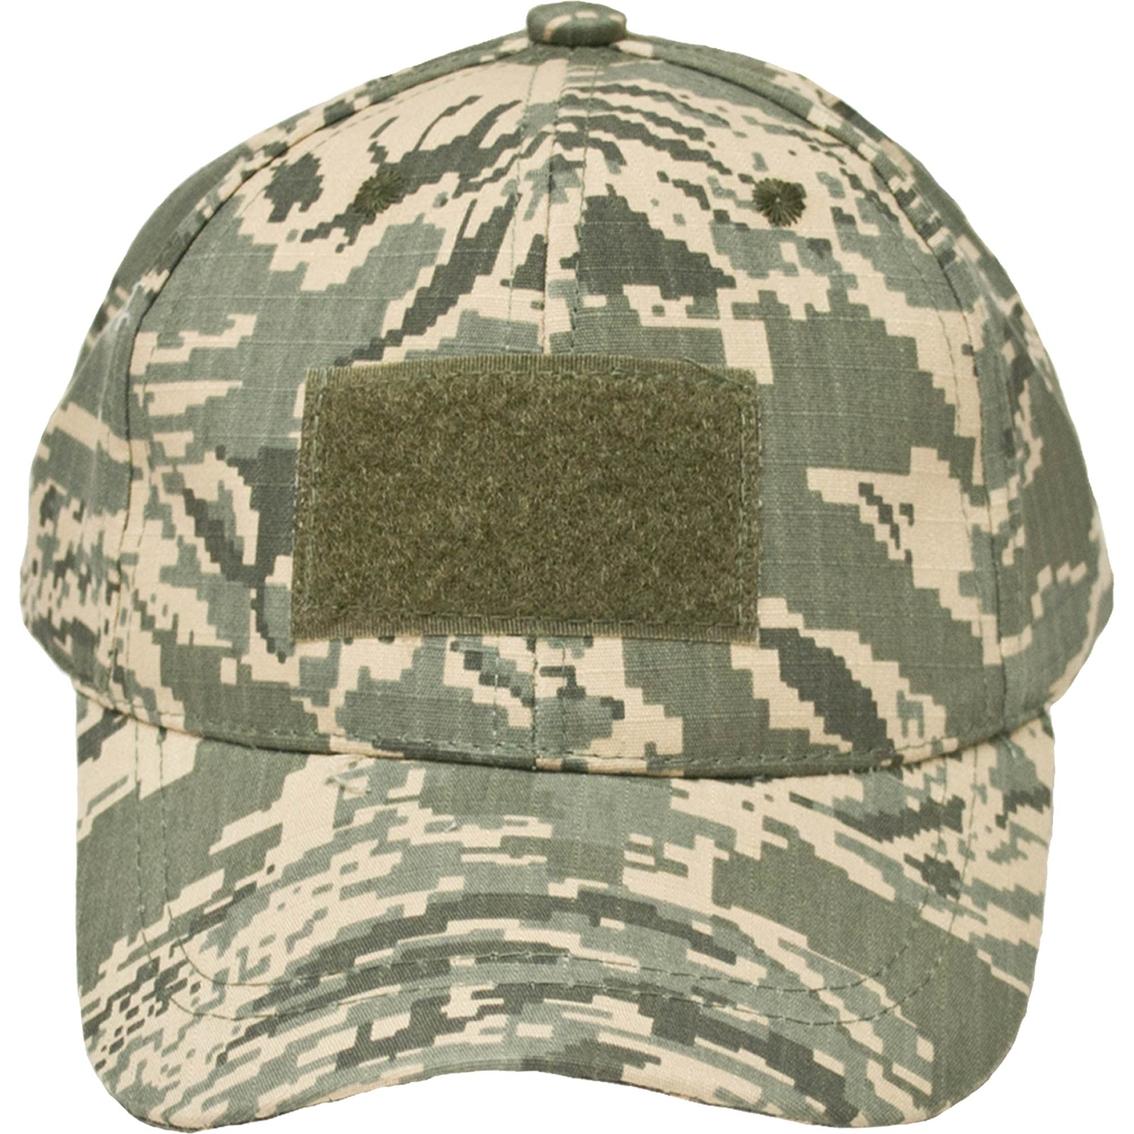 998343e13f352 Trooper Clothing Kids Tactical Abu Air Force Cap | Boys 8-20 ...